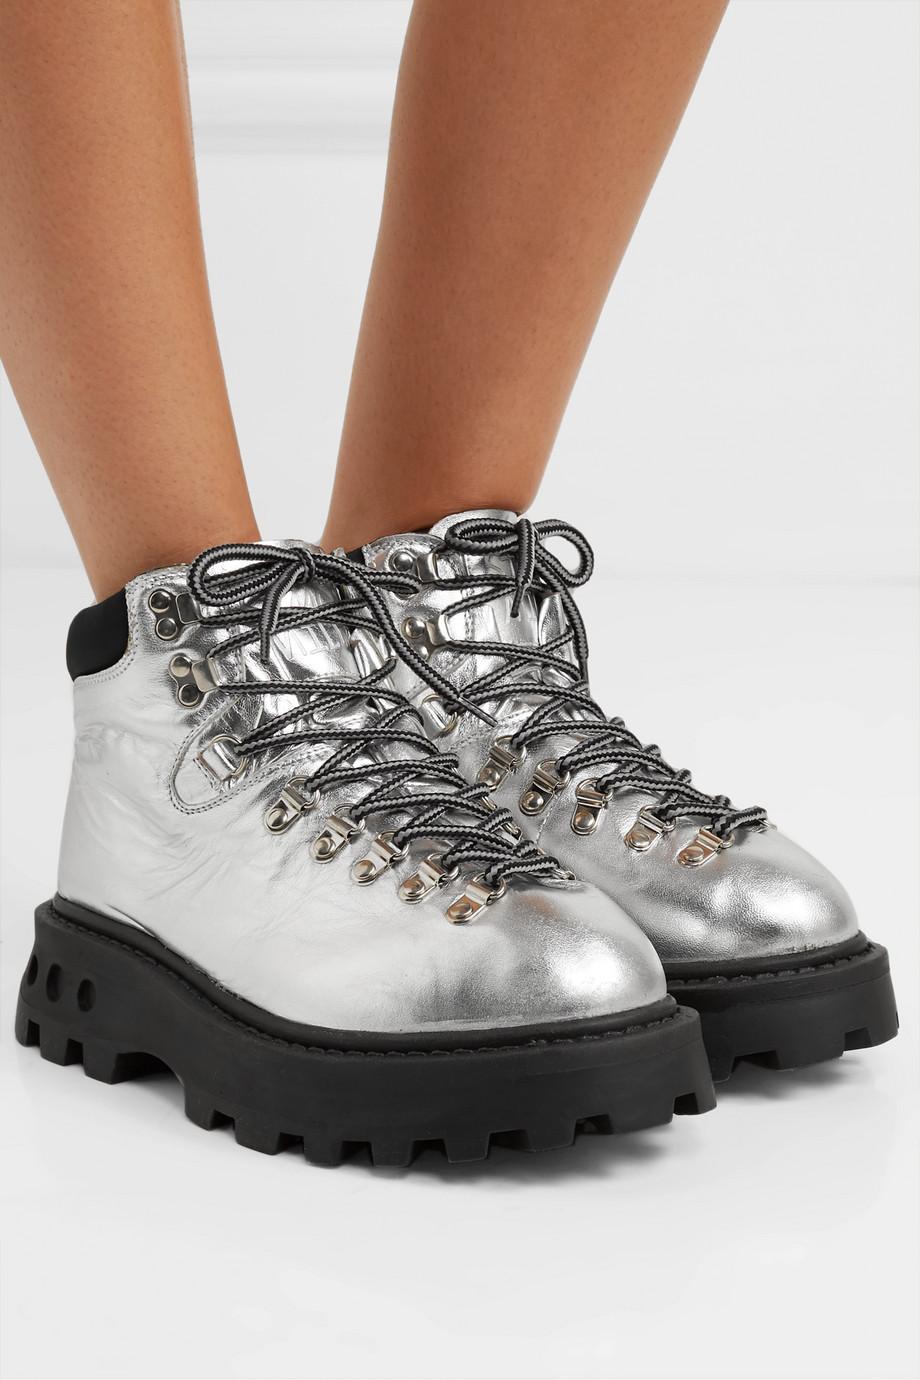 SIMON MILLER High Tracker Schnürschuhe aus Metallic-Leder mit Shell-Besatz